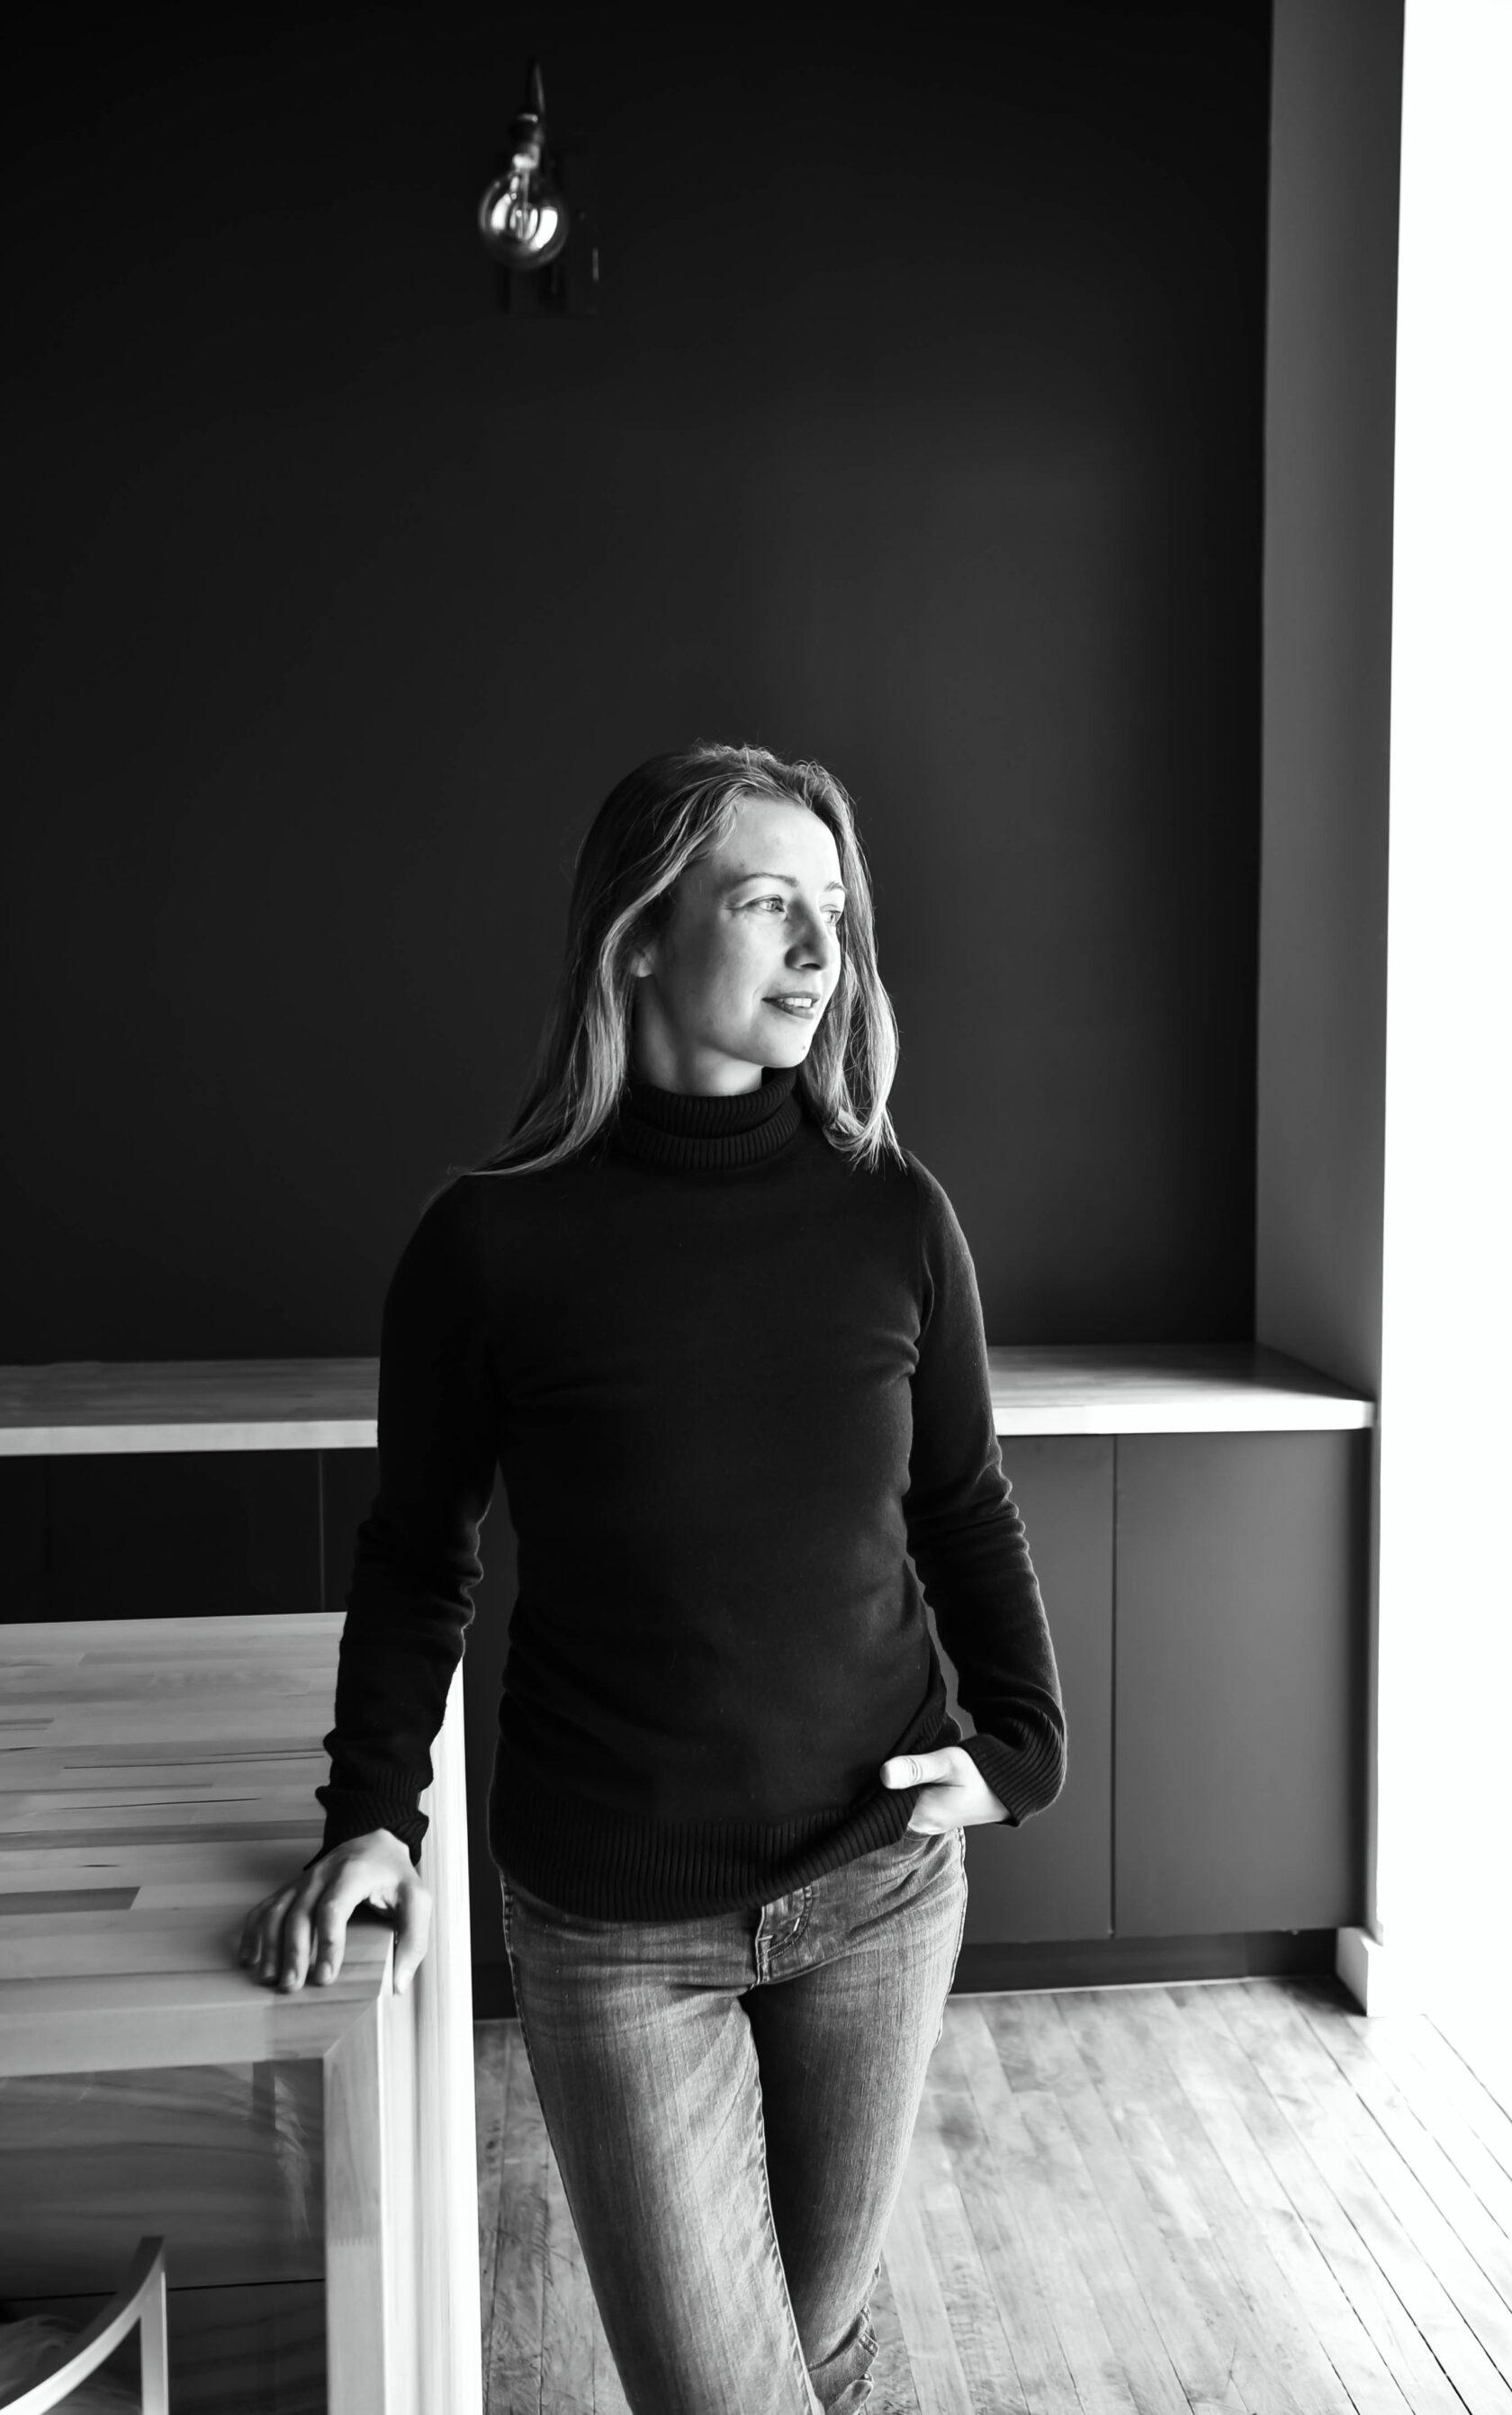 dori betancur studio be profile photo